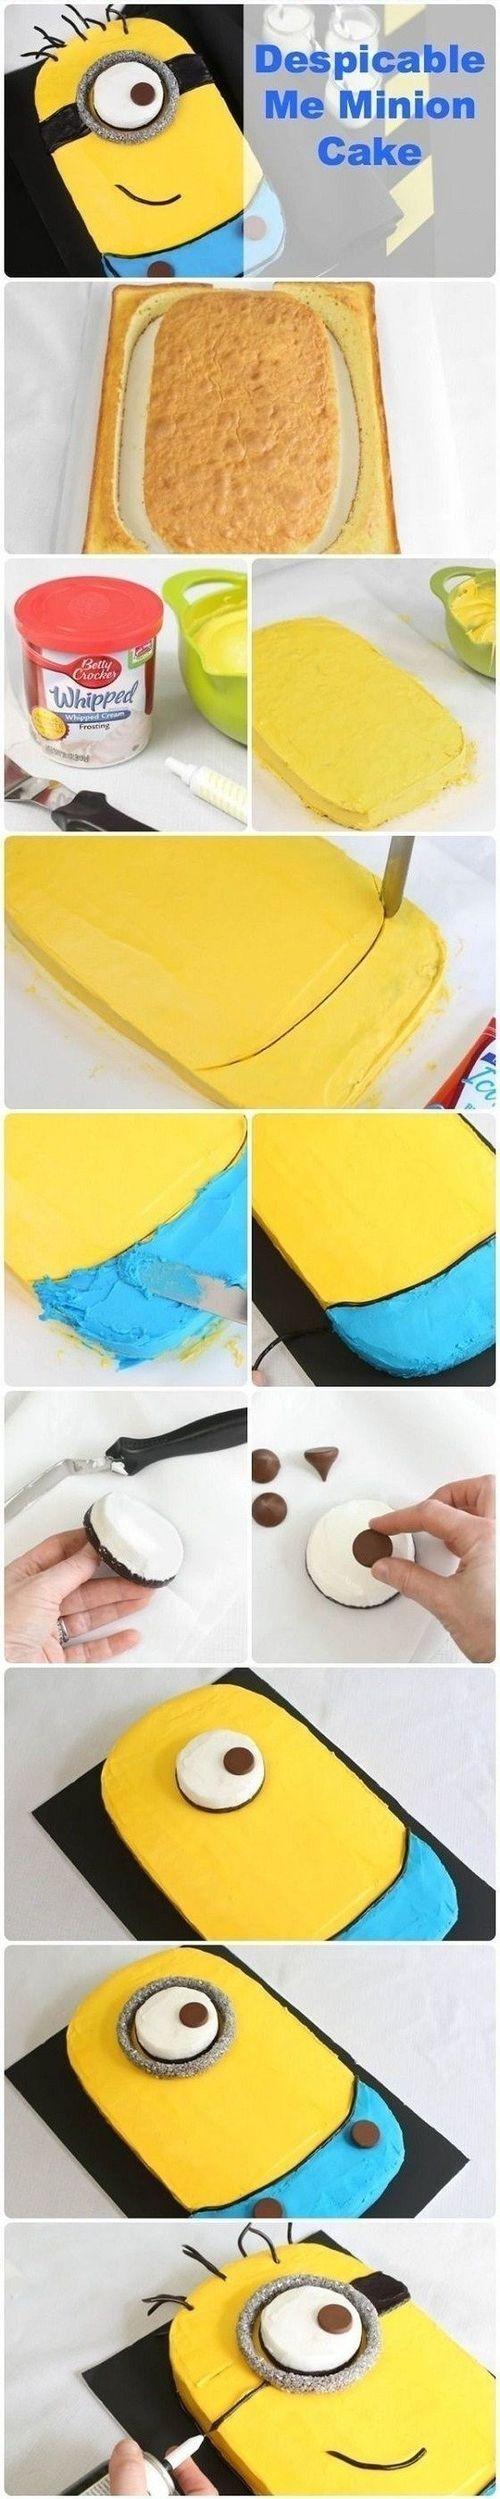 minion cake!!!! me want